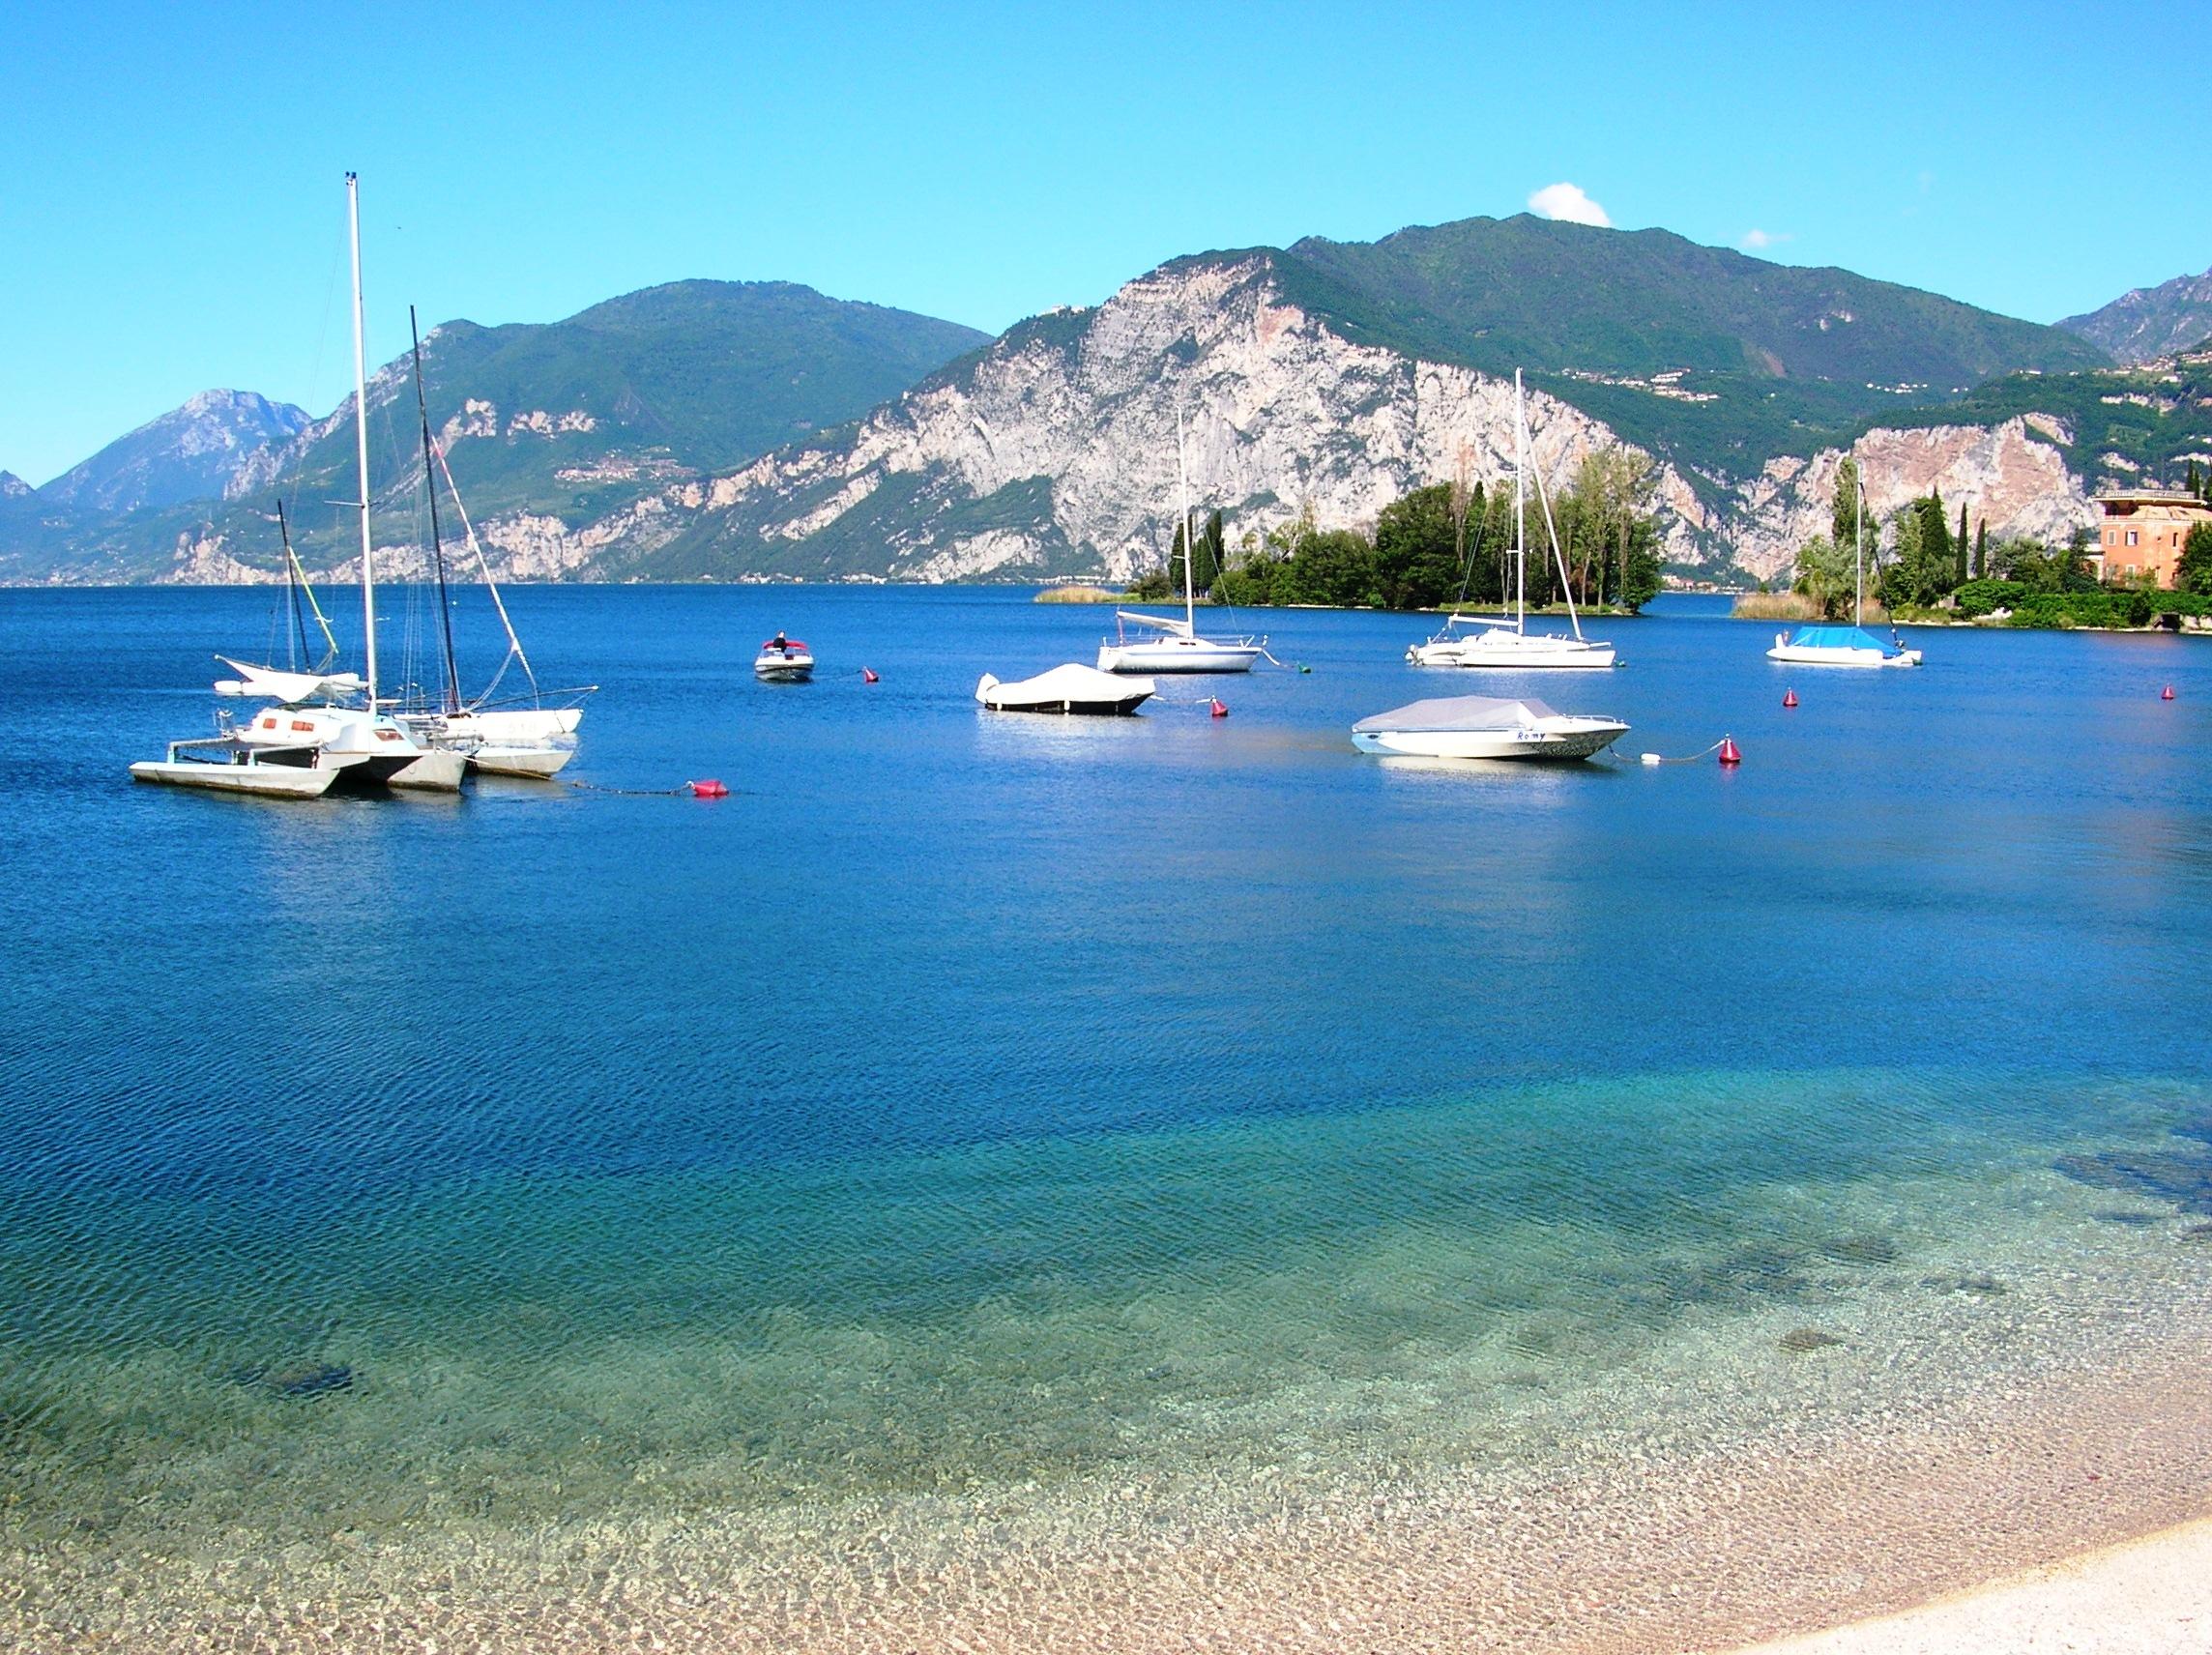 https://www.breakmagazinenews.it/wp-content/uploads/2017/06/Itinerario-del-lago-di-Garda.jpg